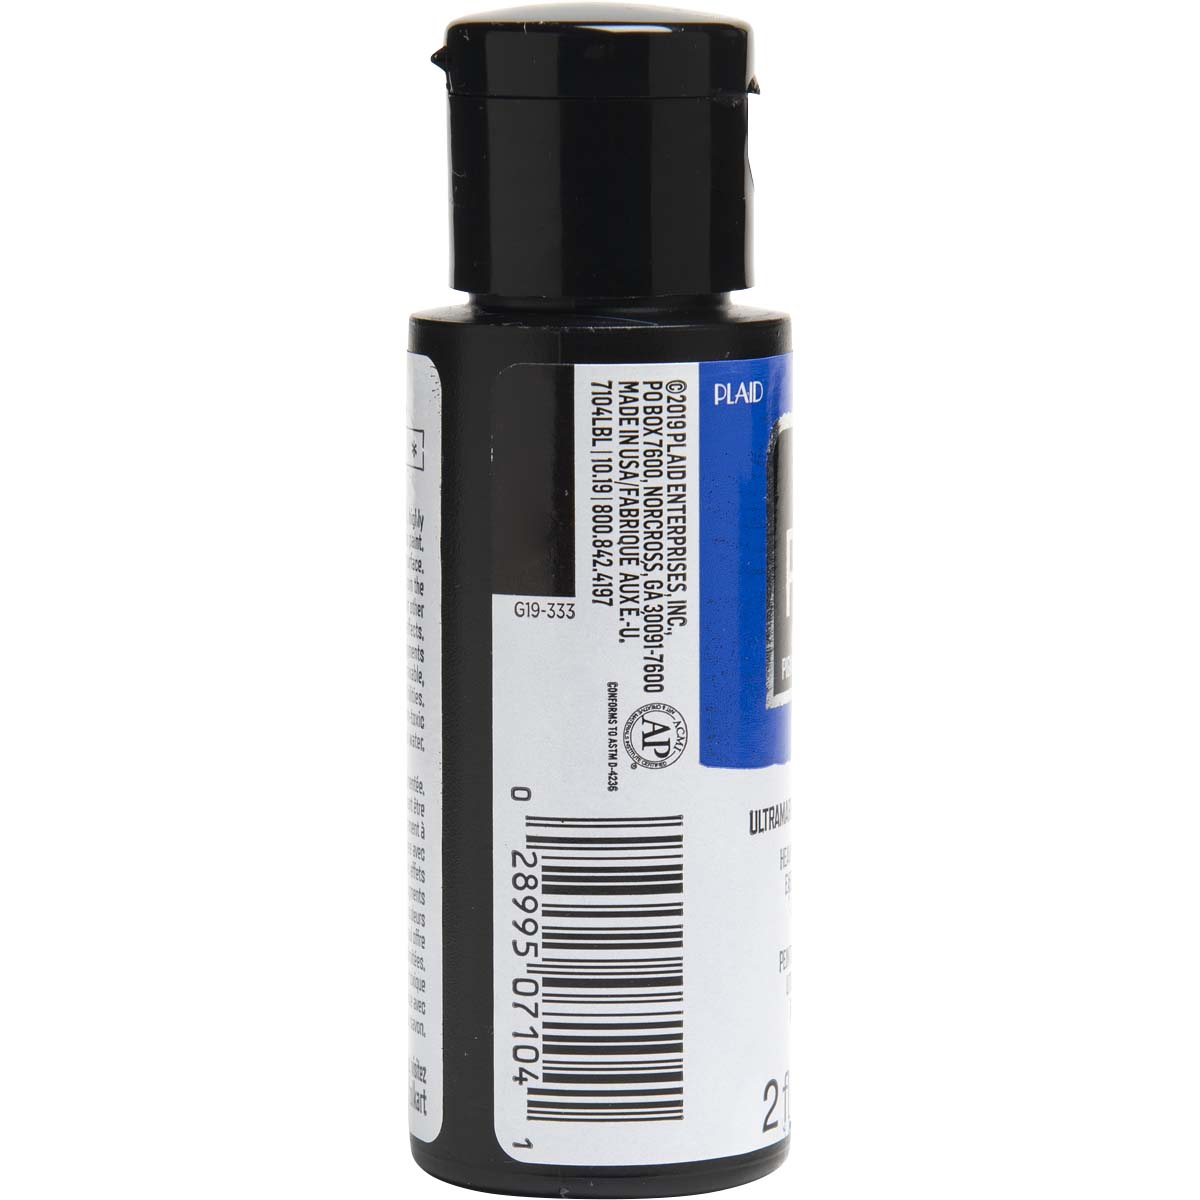 FolkArt ® Pure™ Artist Pigment - Ultramarine Blue, 2 oz. - 7104